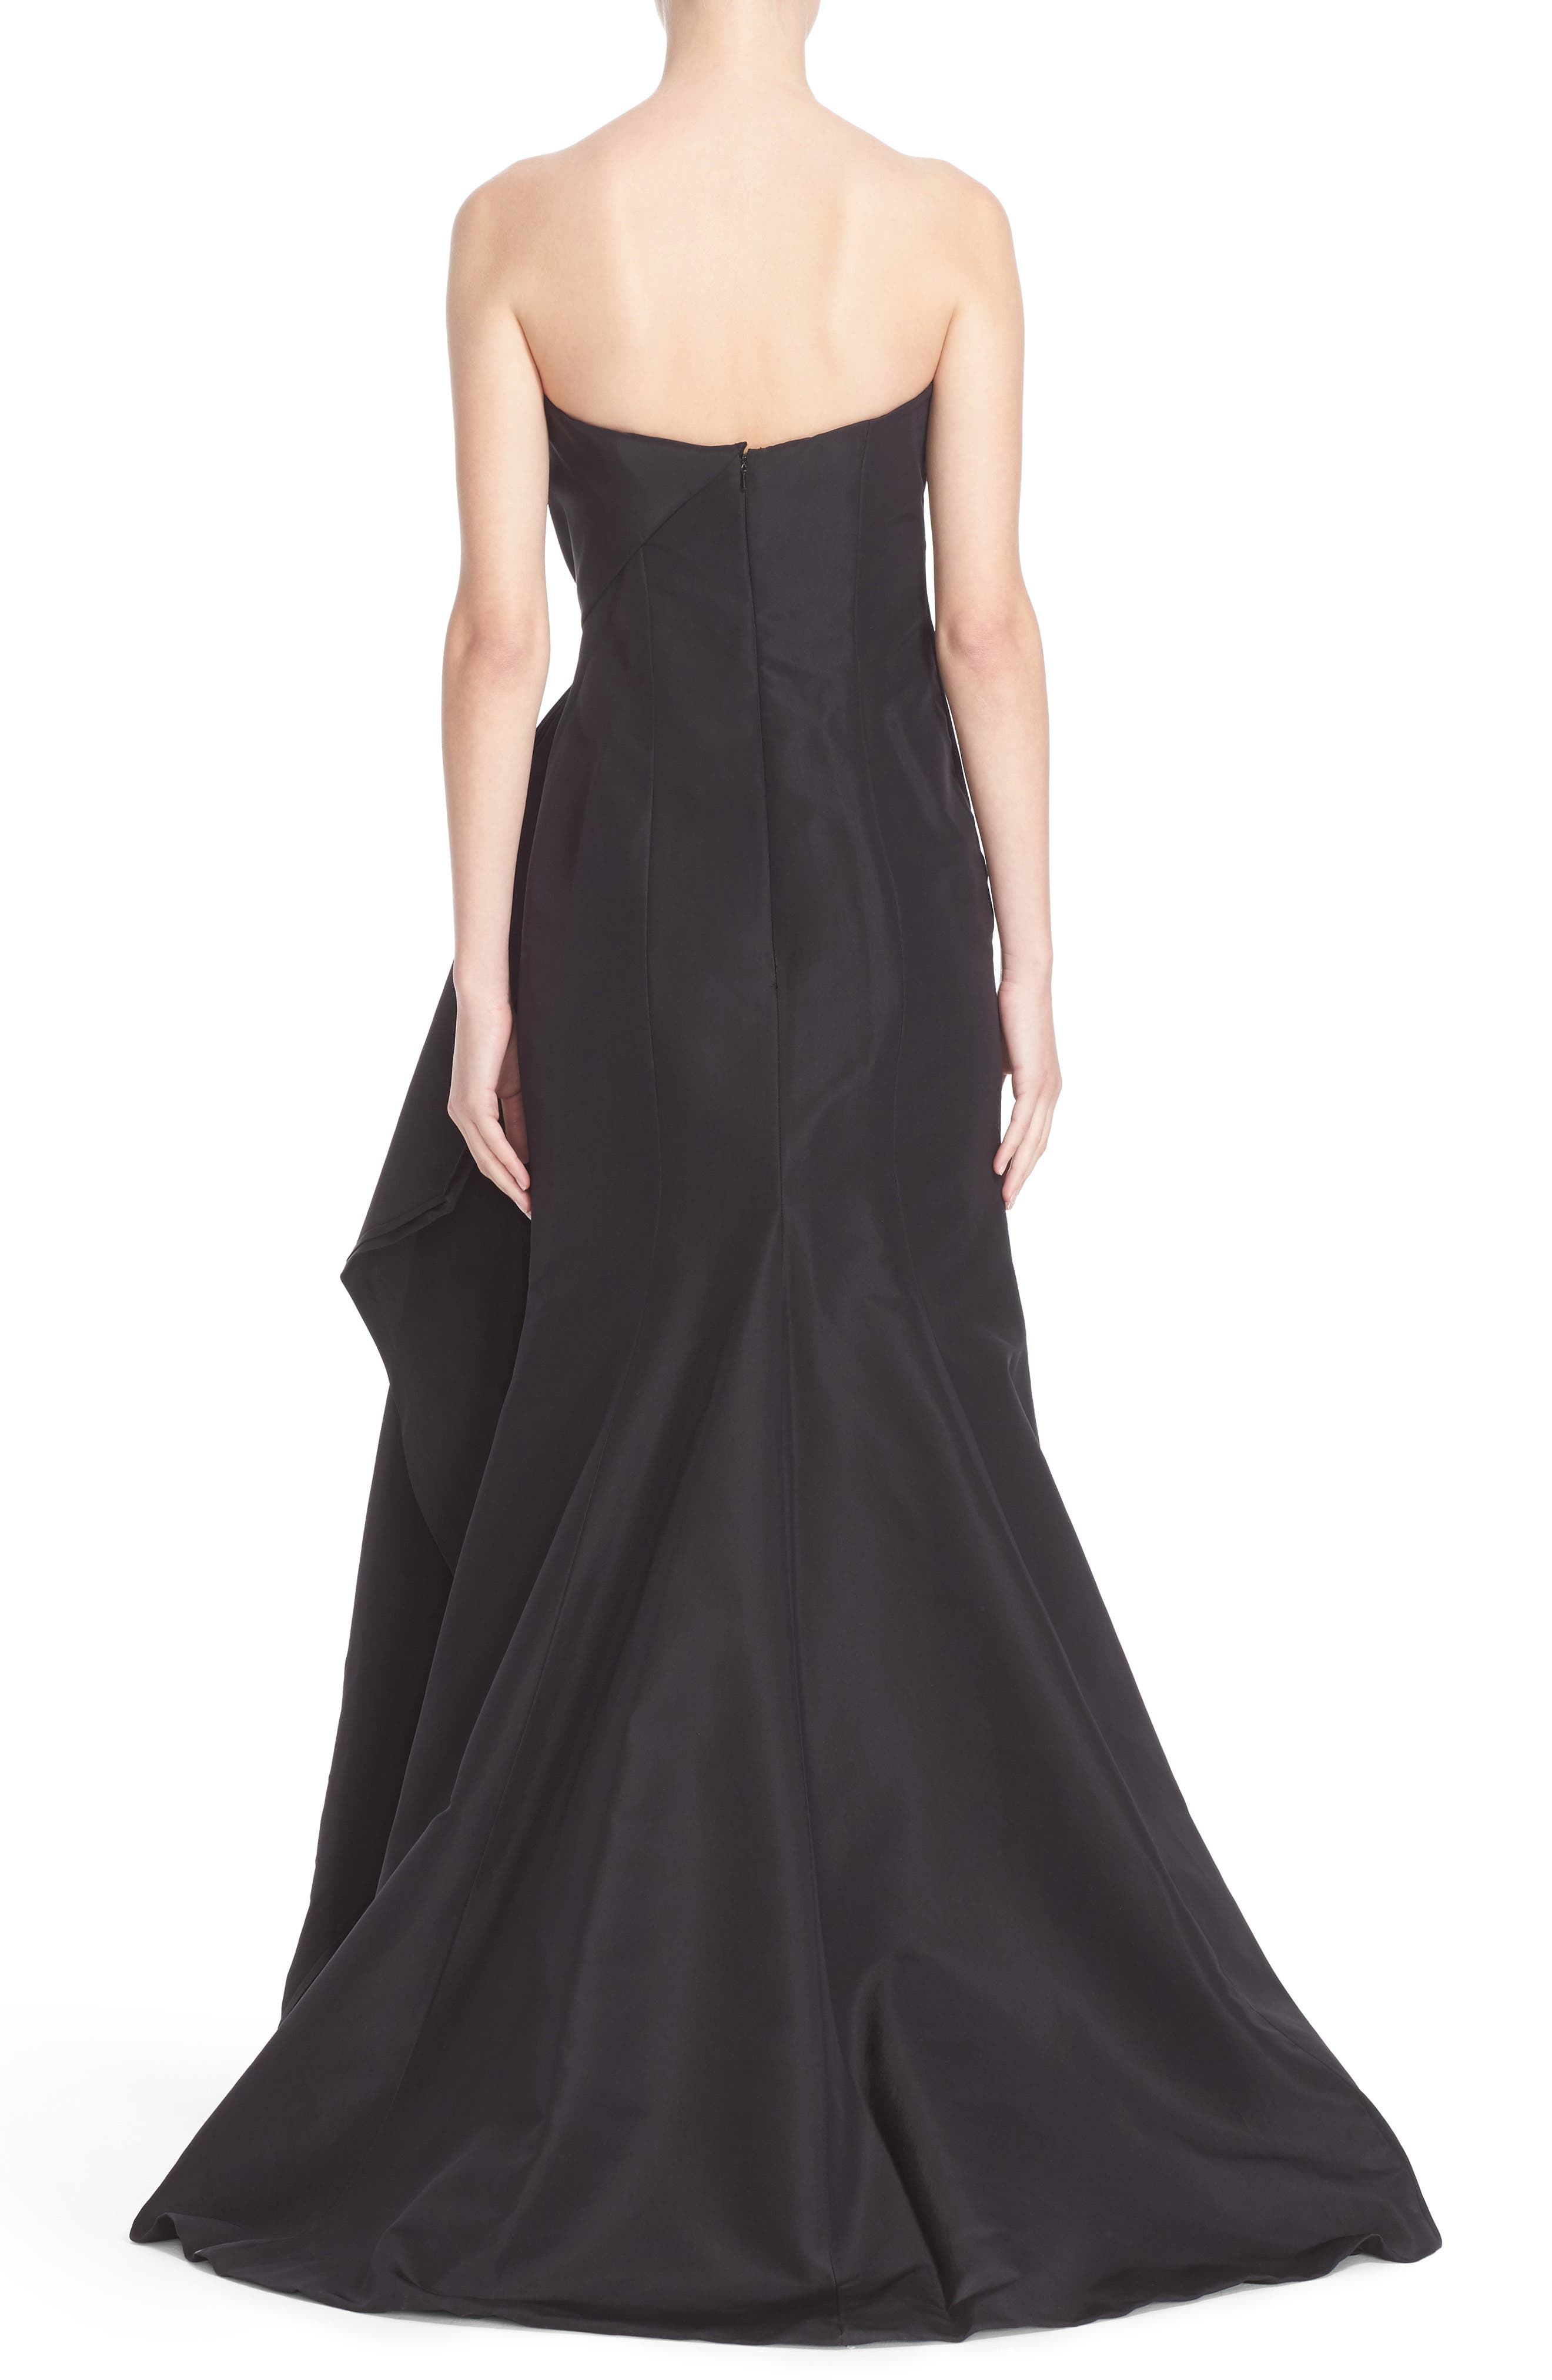 Alternate Image 2  - Carolina Herrera Bow Detail Strapless Silk Faille Gown (Nordstrom Exclusive)